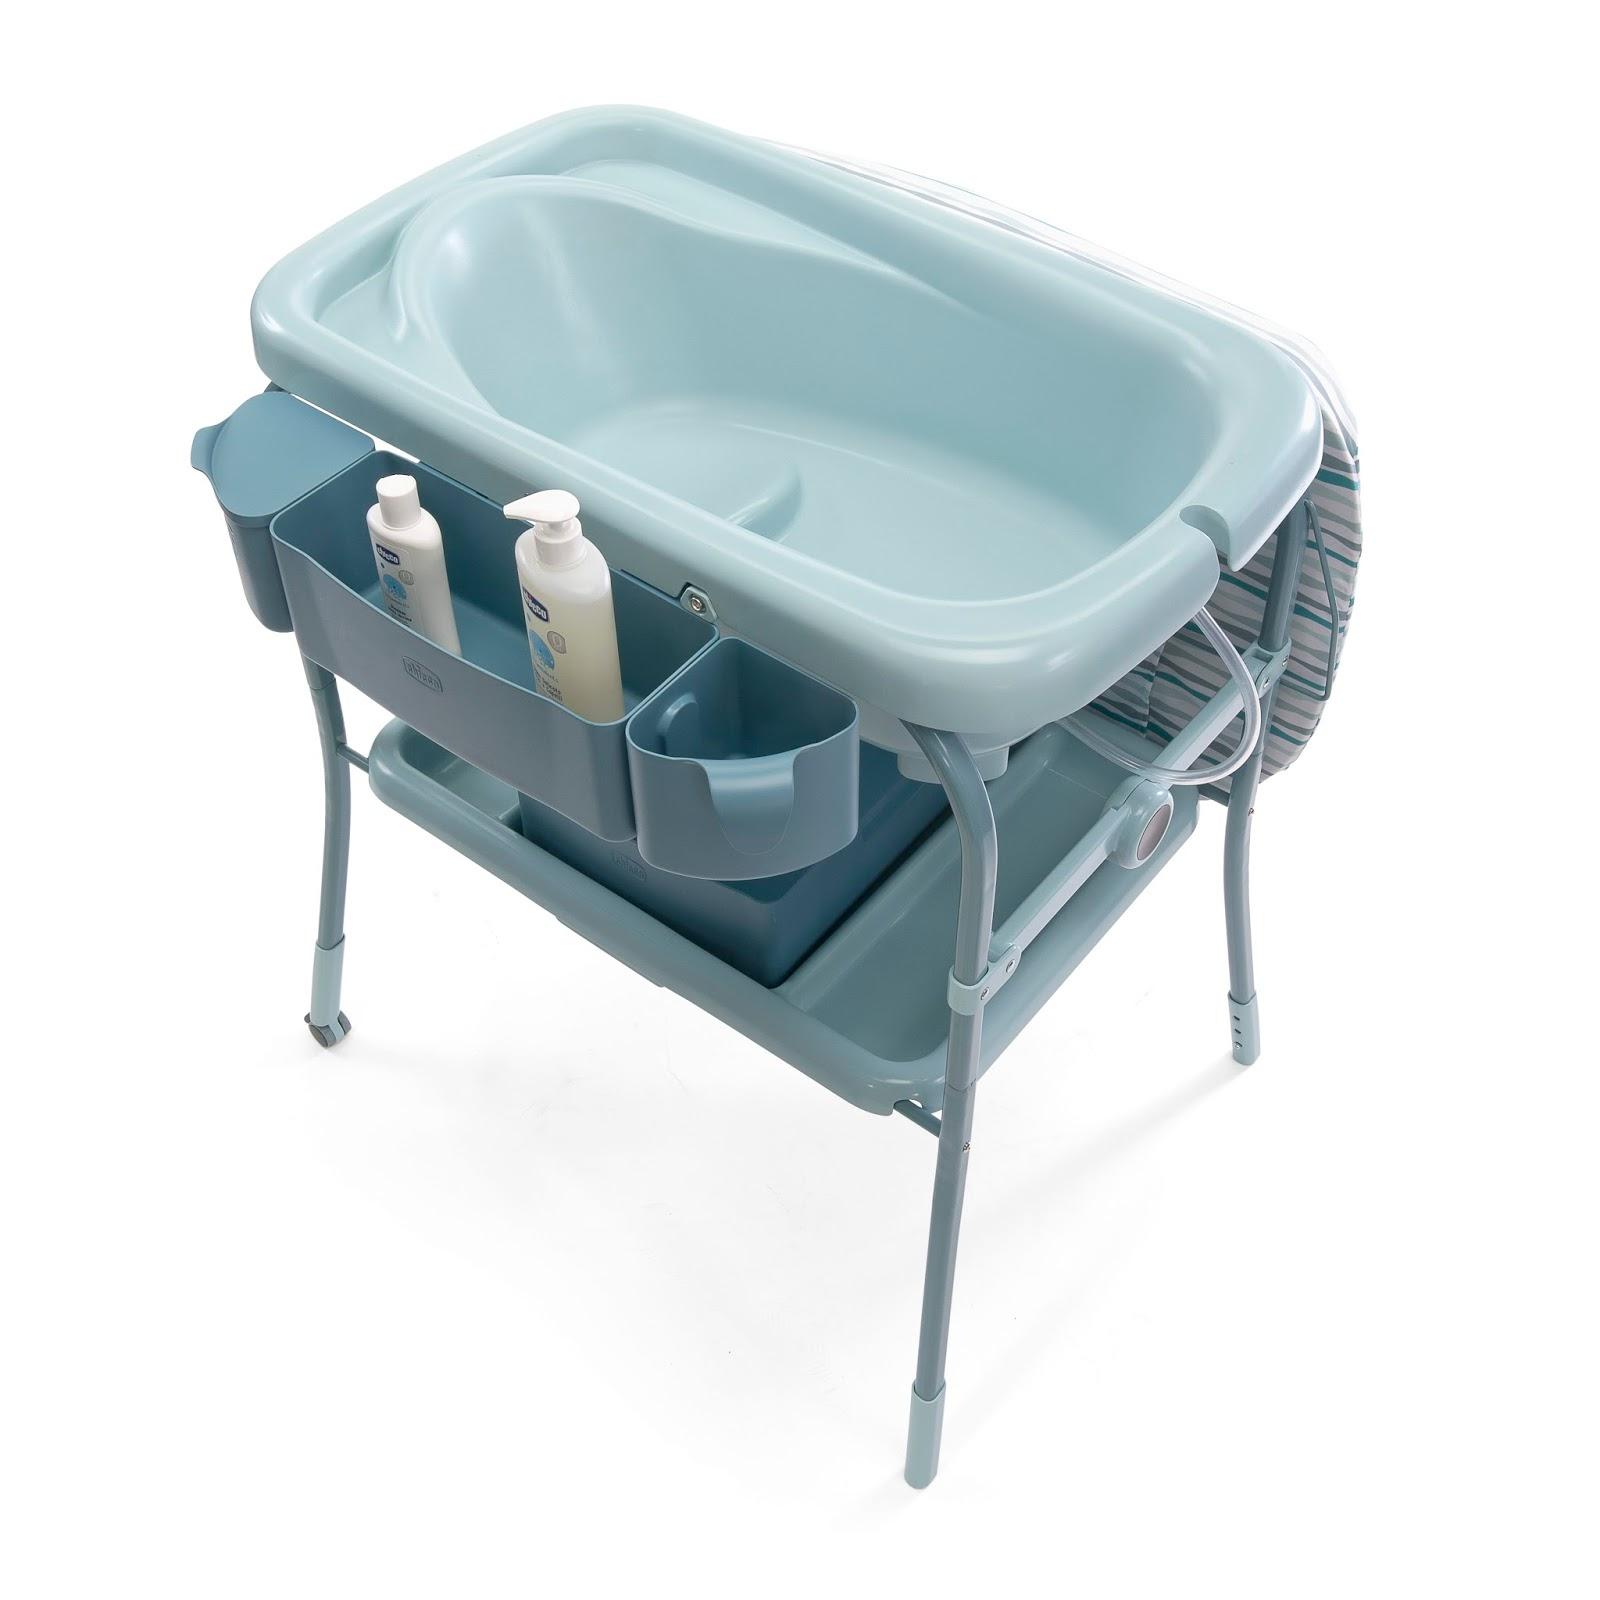 table a langer orchestra conceptions de maison. Black Bedroom Furniture Sets. Home Design Ideas